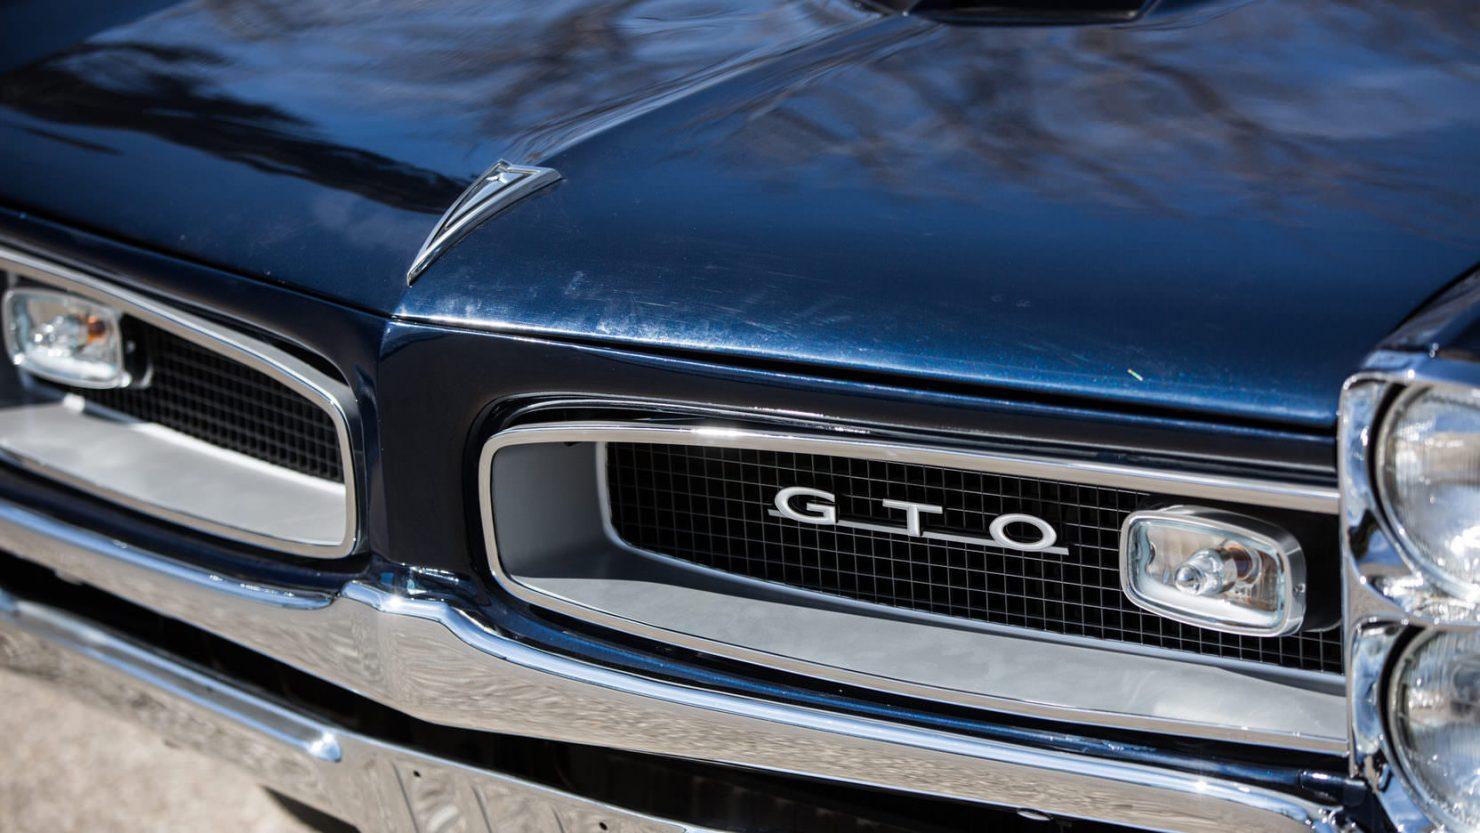 Pontiac GTO Tri Power 8 1480x833 - 1966 Pontiac GTO Tri-Power